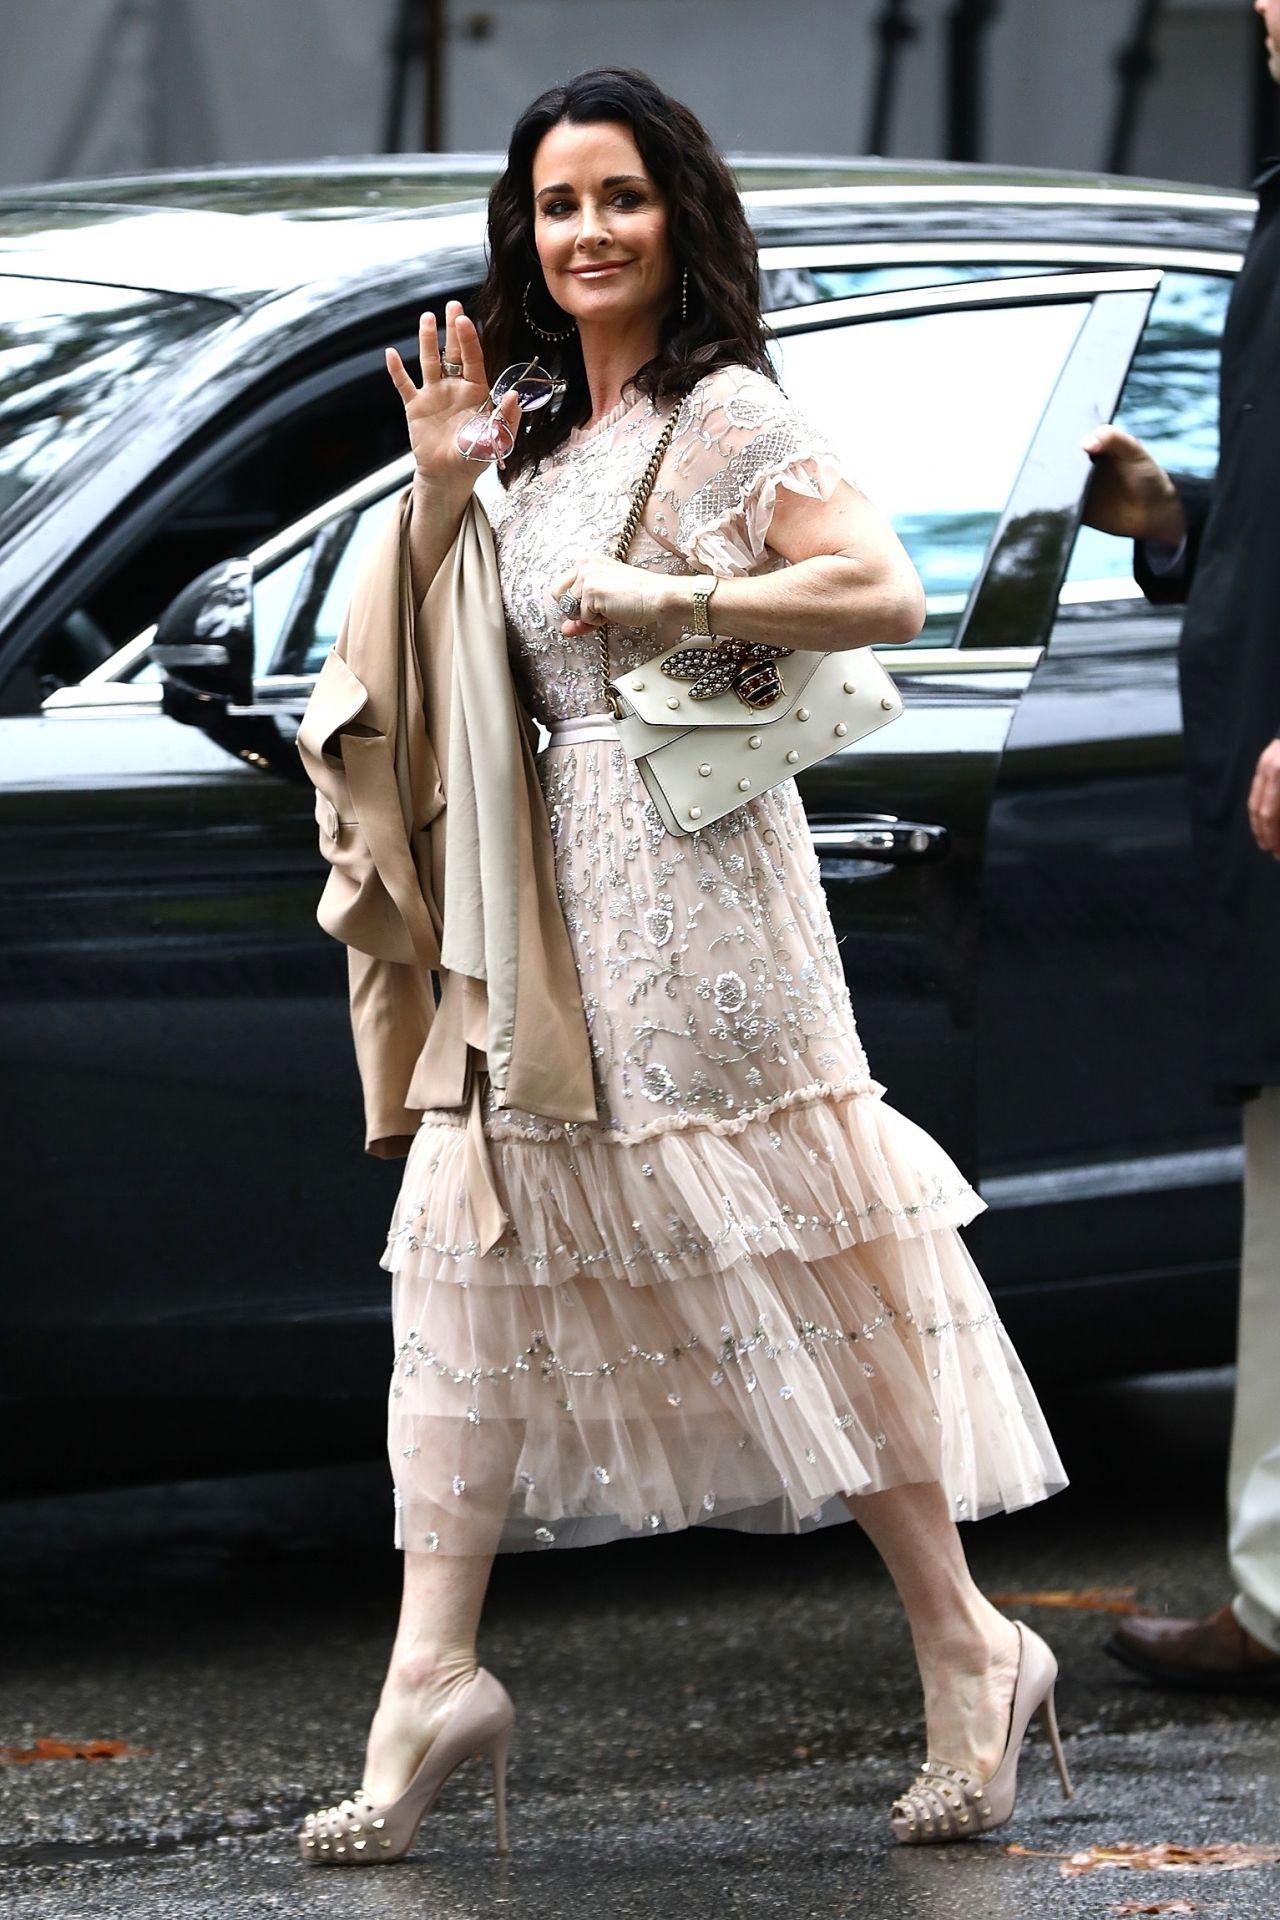 Kyle Richards Arriving at Khloe Kardashian s Baby Shower at the